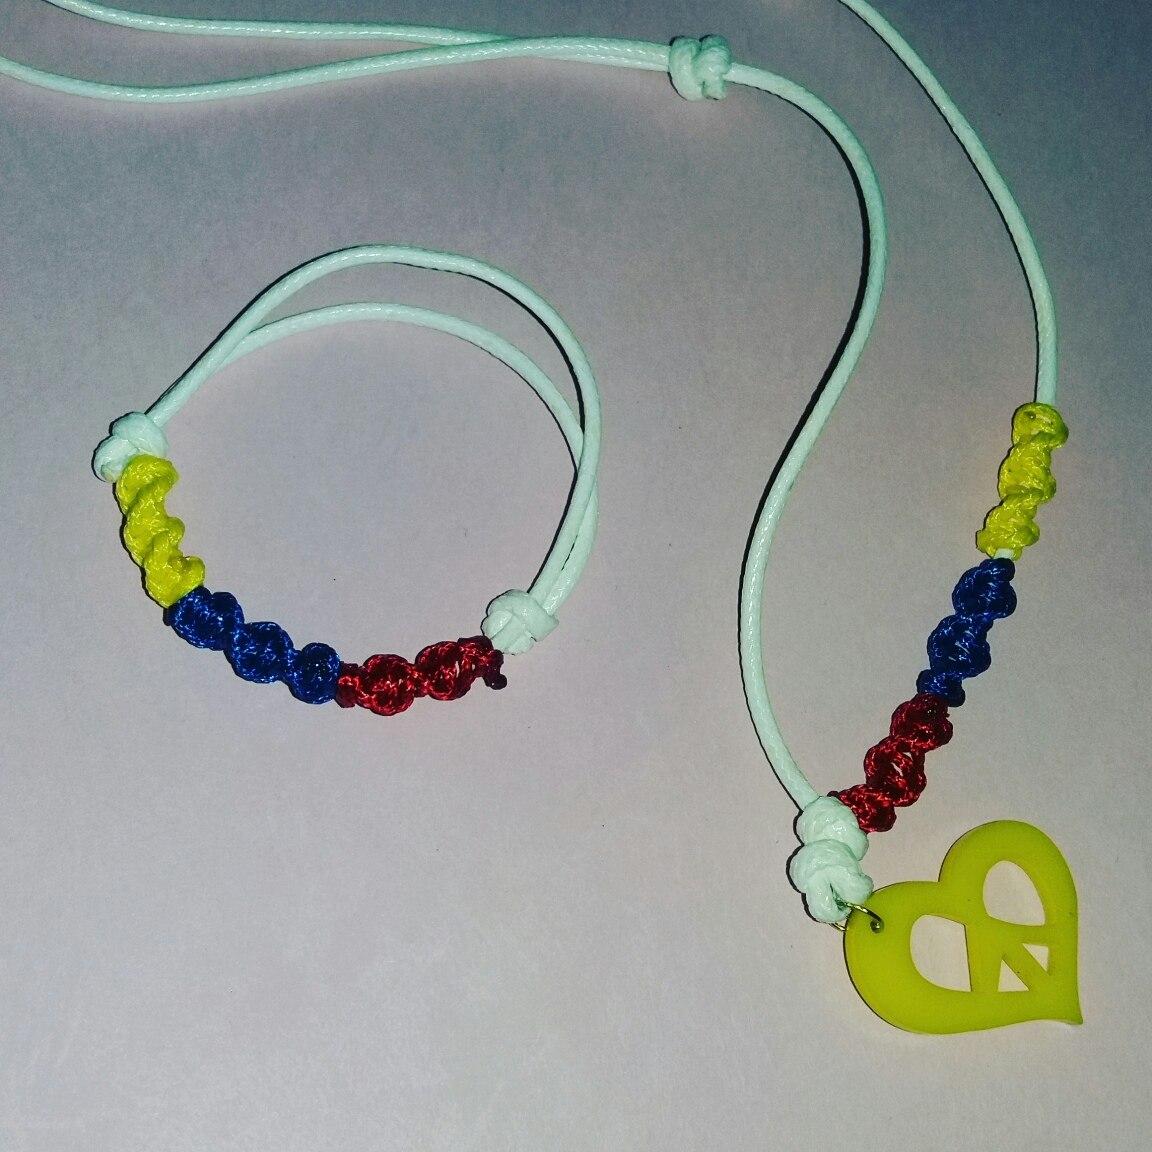 5e40ff6c1008 collar ajustable cuero dama bisuteria venezuela. Cargando zoom.